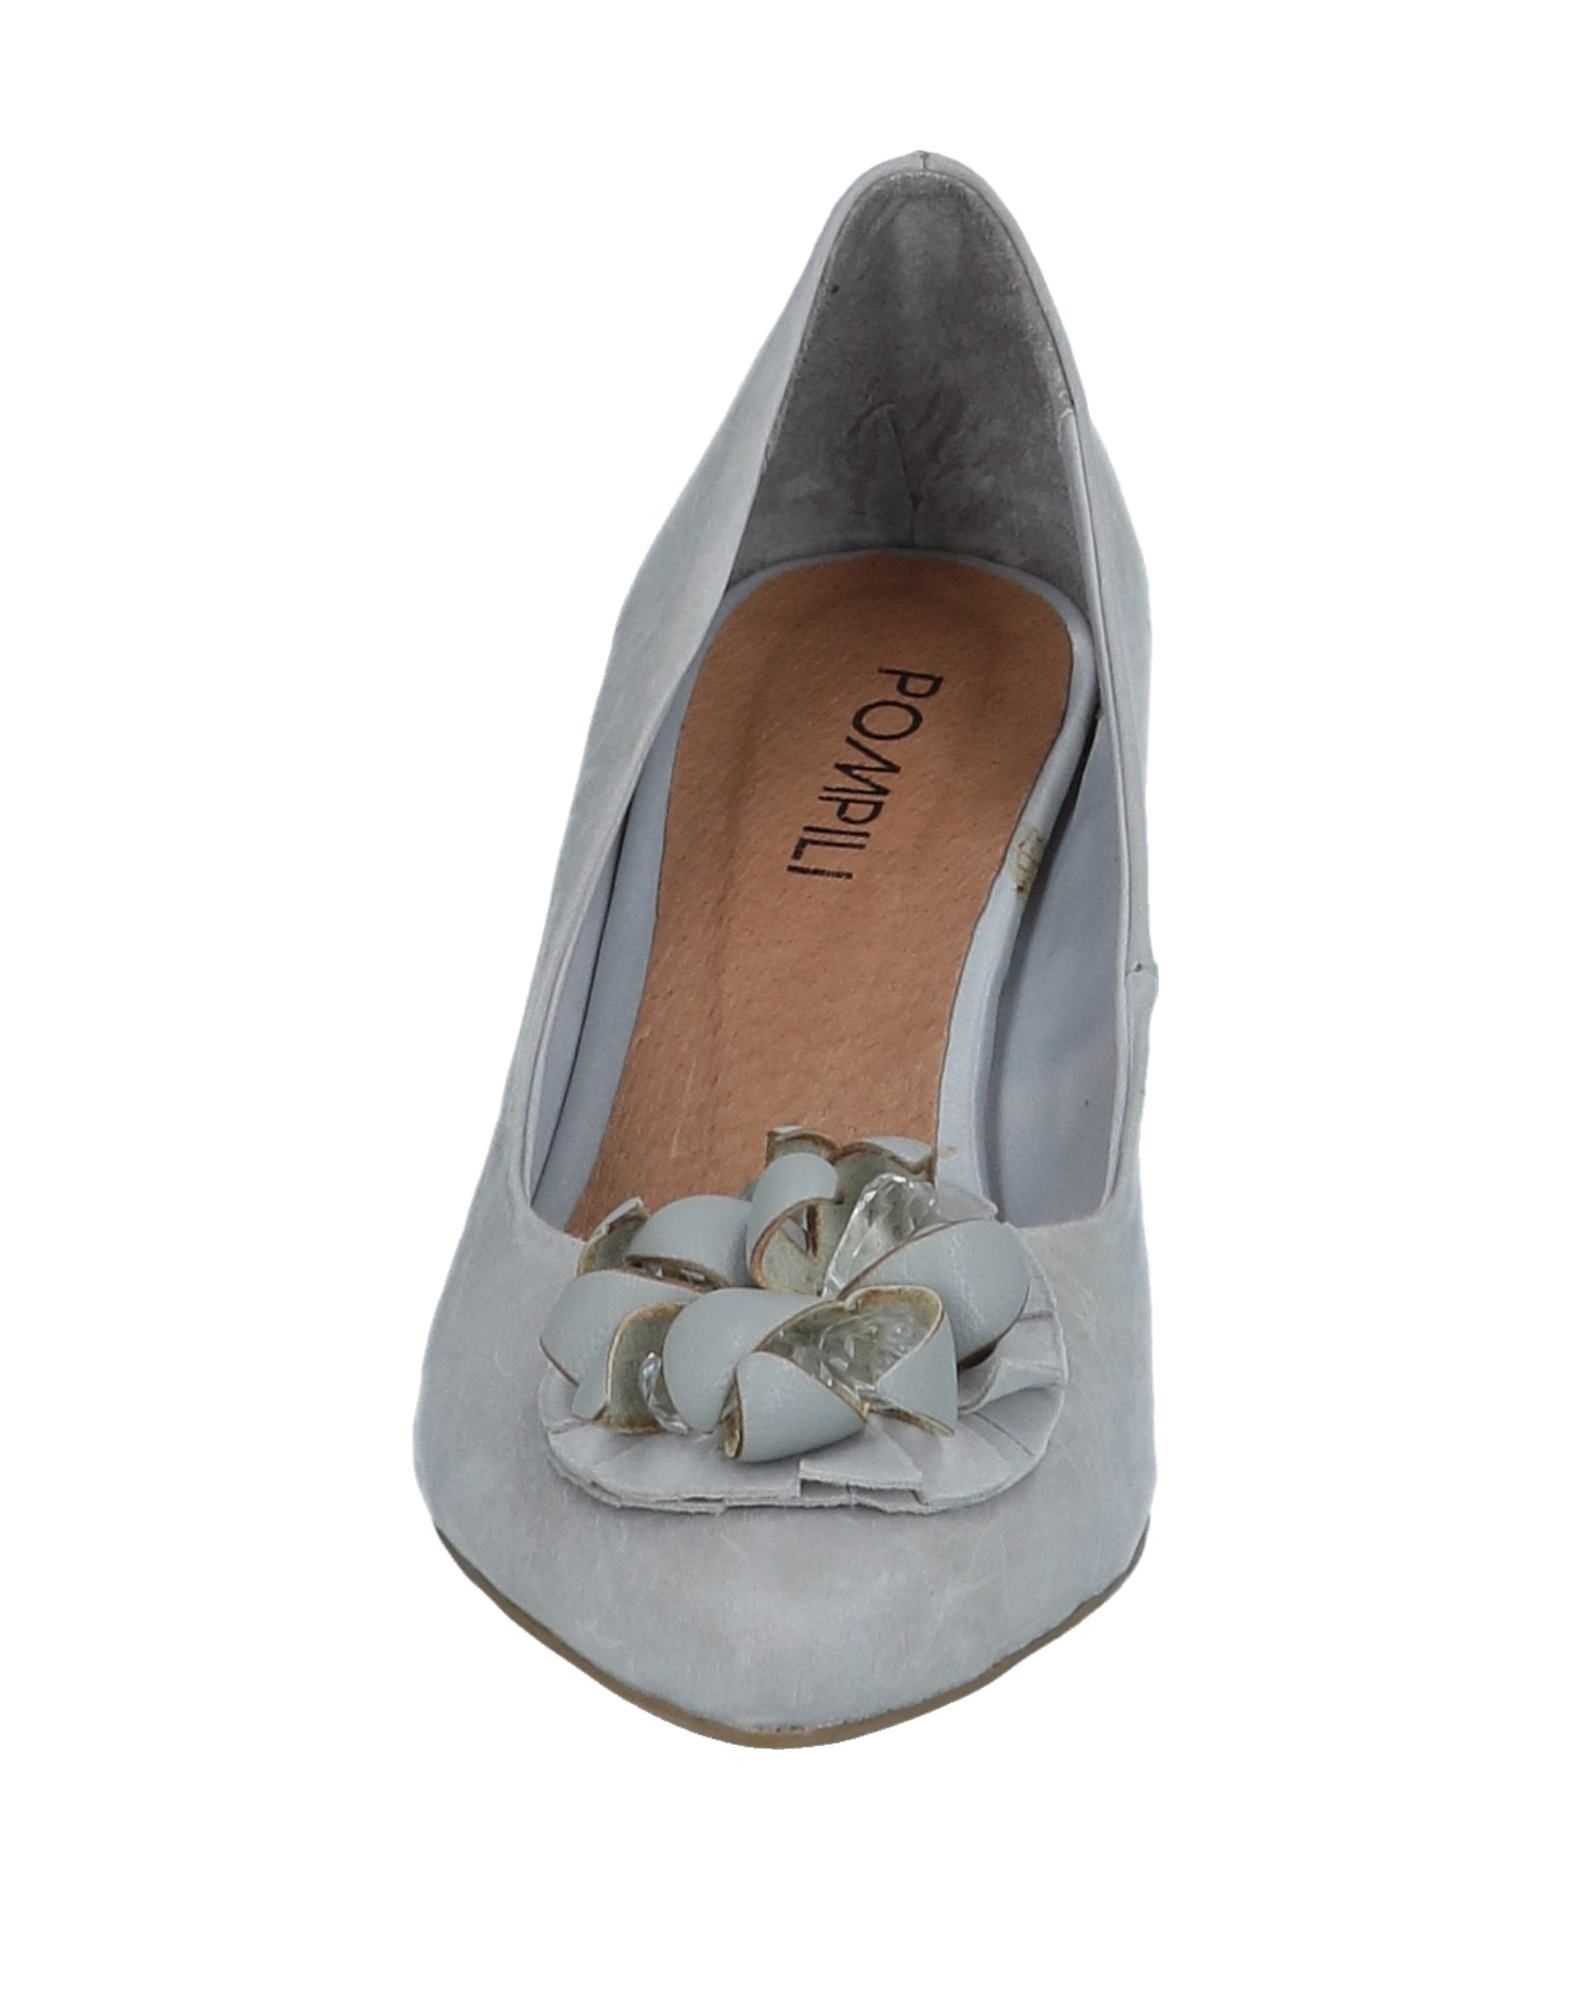 Pompili Pumps Damen  beliebte 11522523HJ Gute Qualität beliebte  Schuhe 3edc64